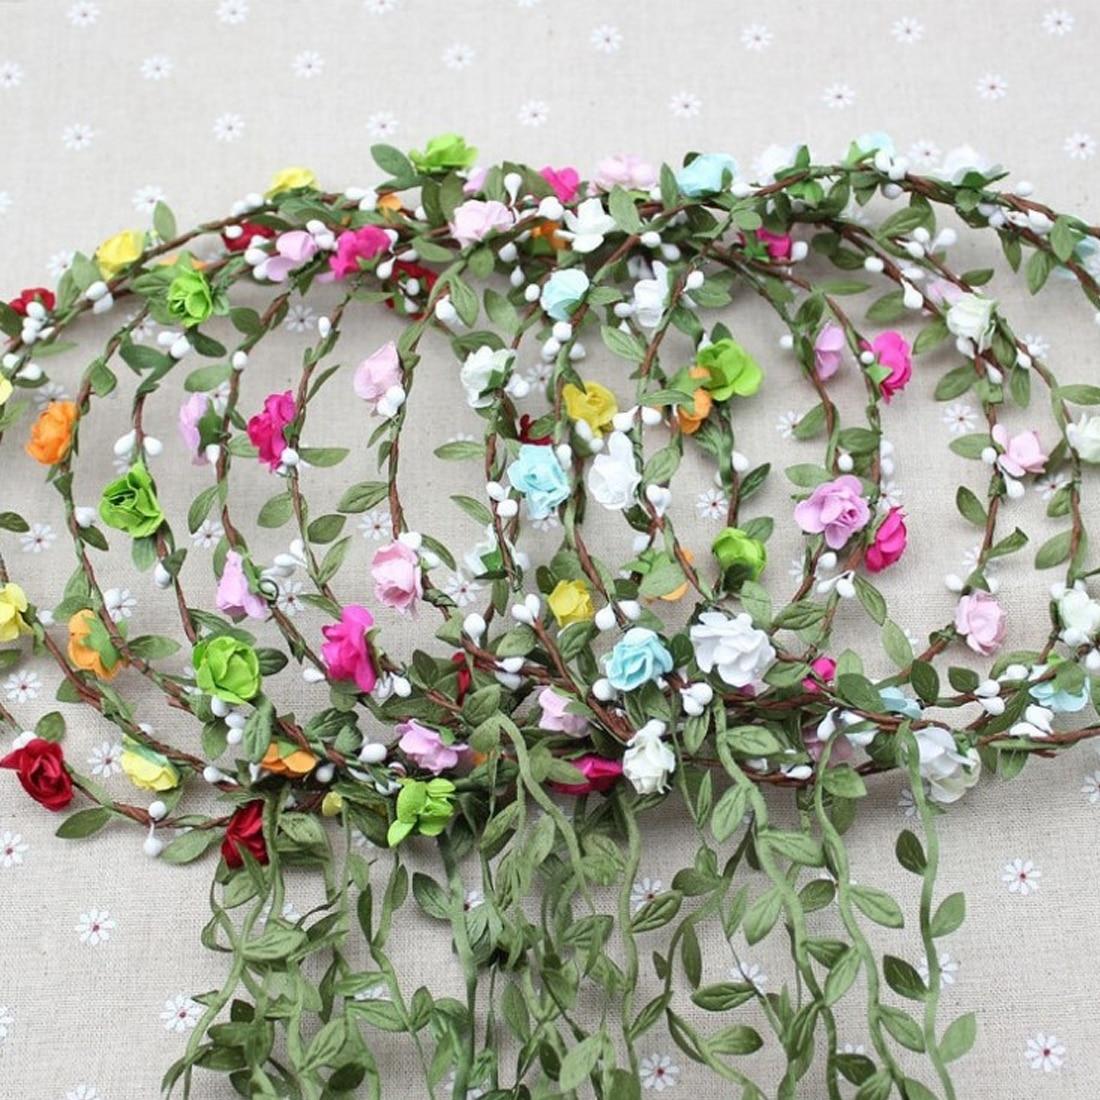 Girls Wedding Flower Crown Wreath Bohemian Vine Adjustable Yarn Garland Sweet Hair Bands Accessories For Bride Bridesmaid